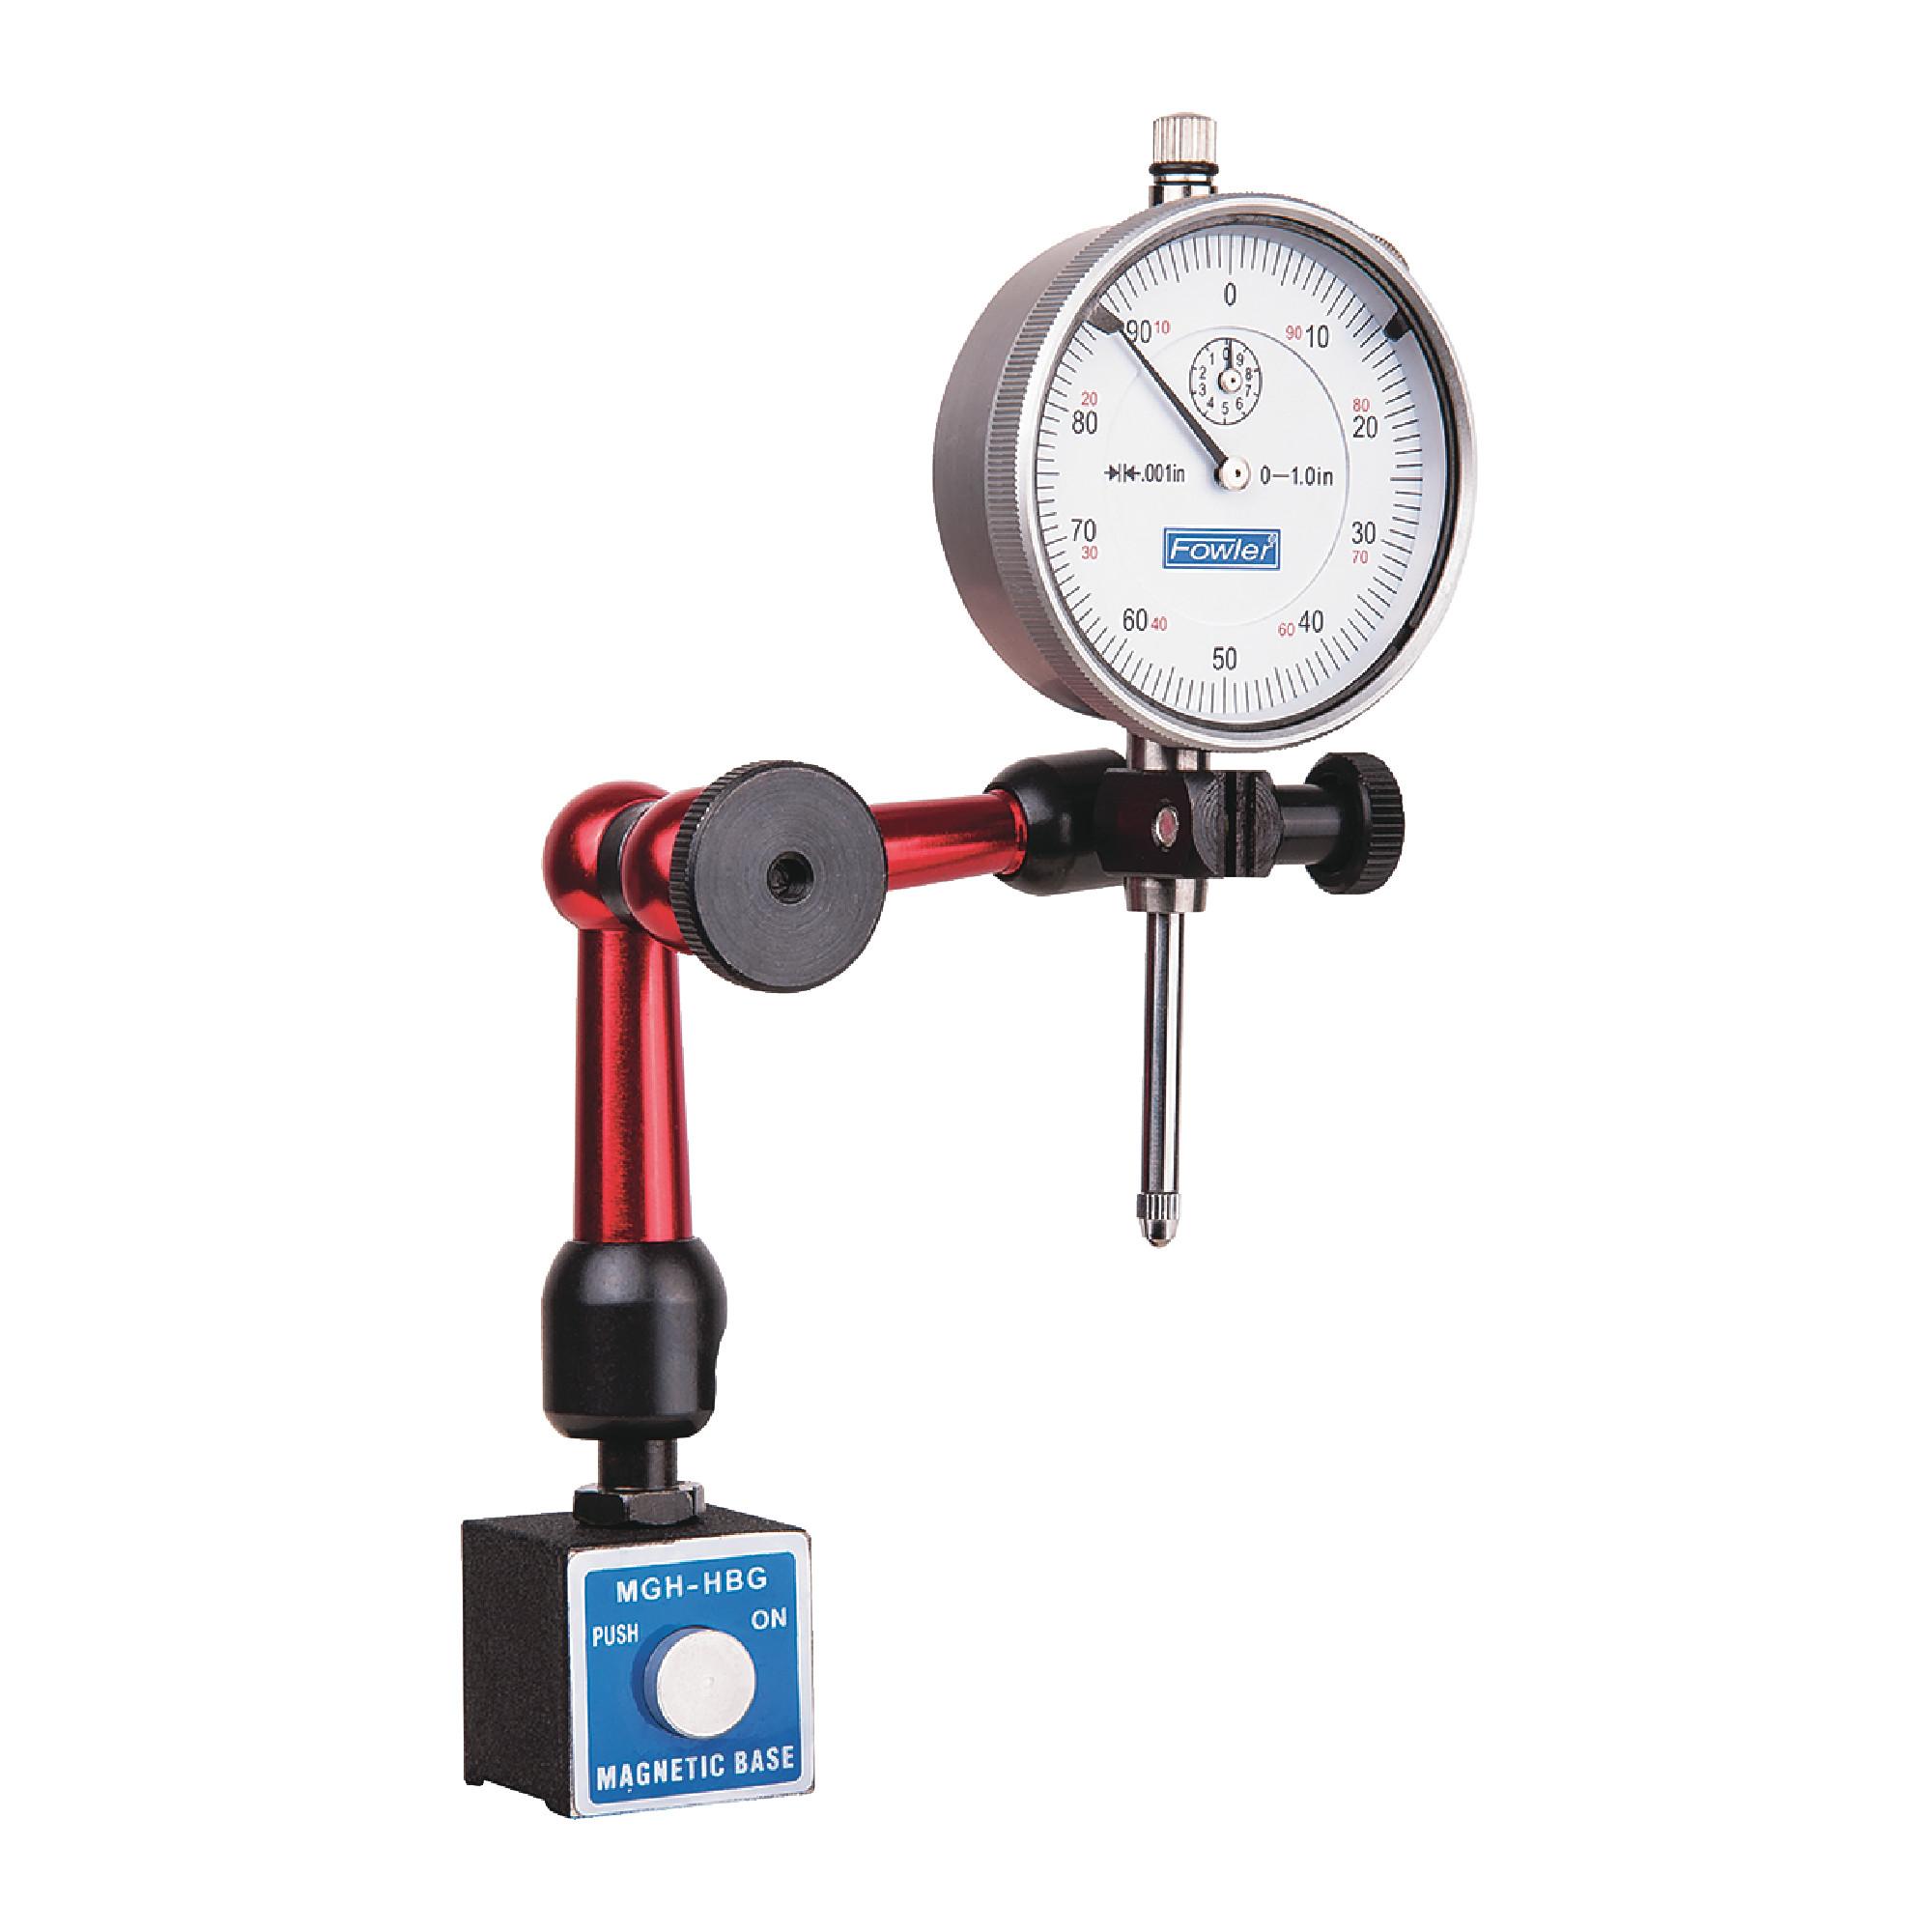 Locking Arm Mag Base & Indicator Set